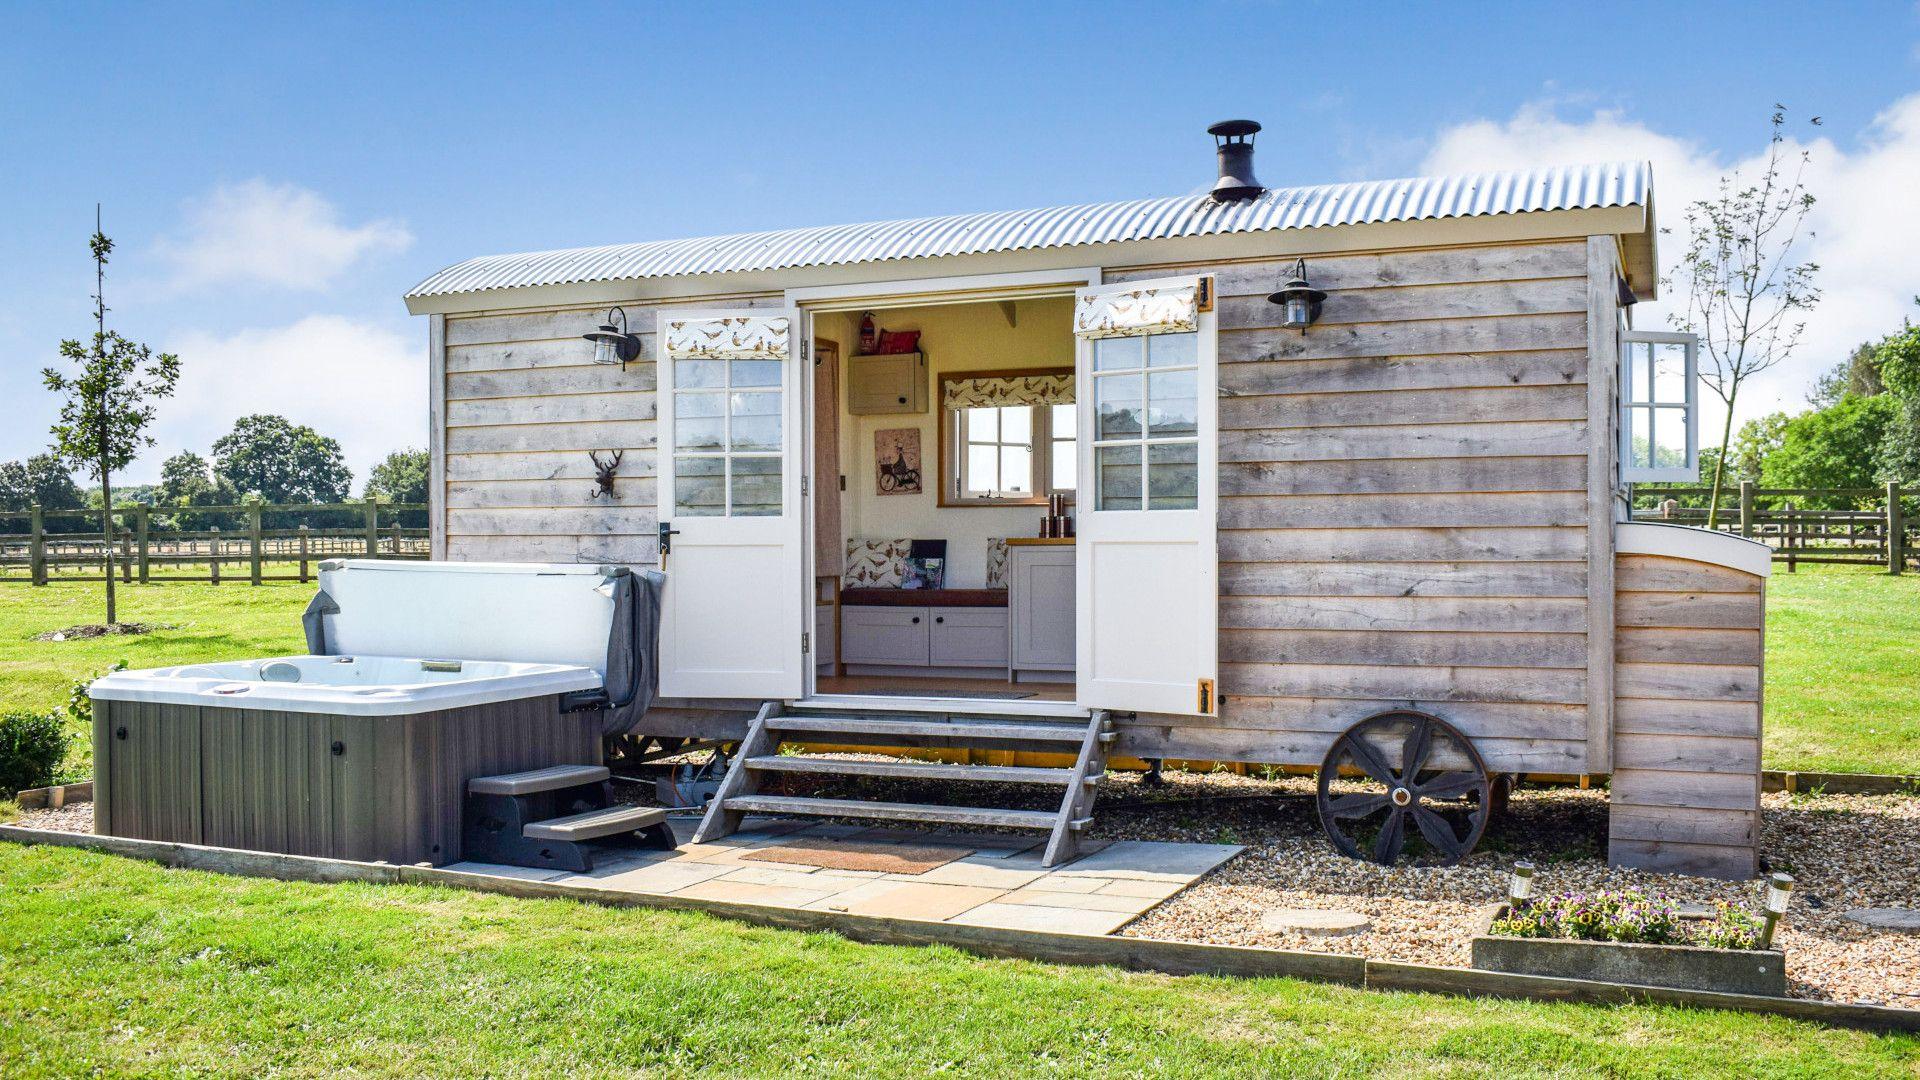 Hut with hot tub, Shepherds Hut at Avon Farm, Bolthole Retreats